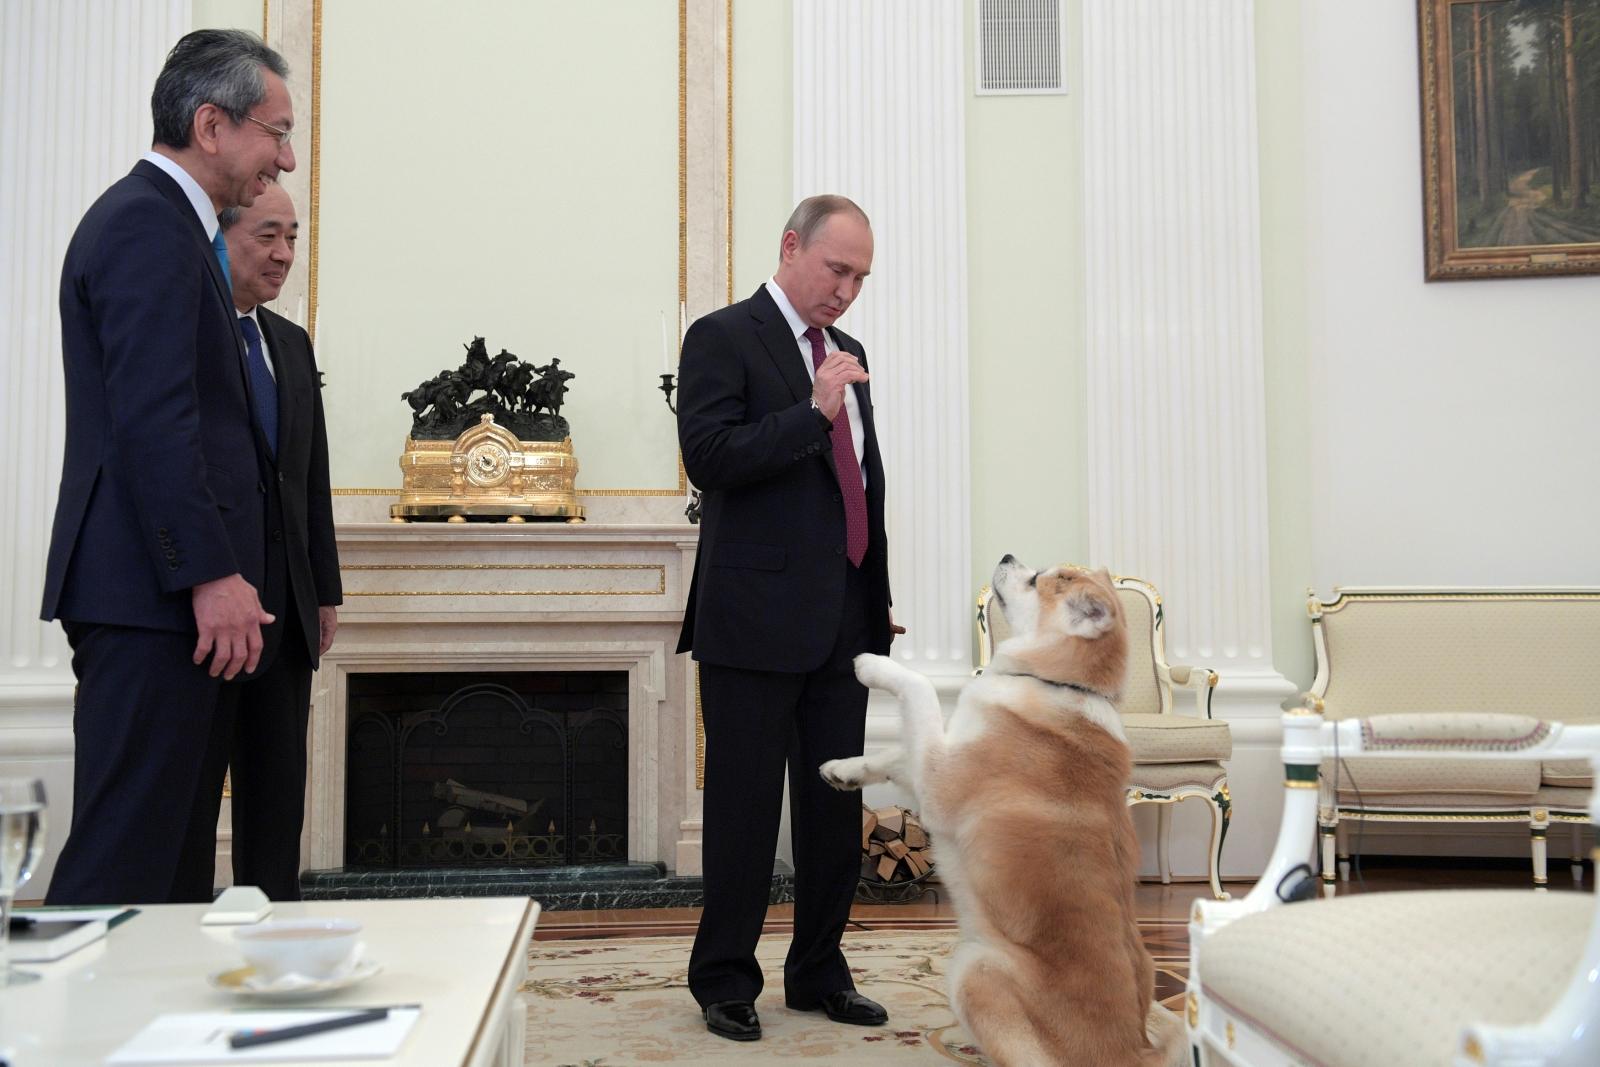 Vladimir Putin dog diplomacy, Yume